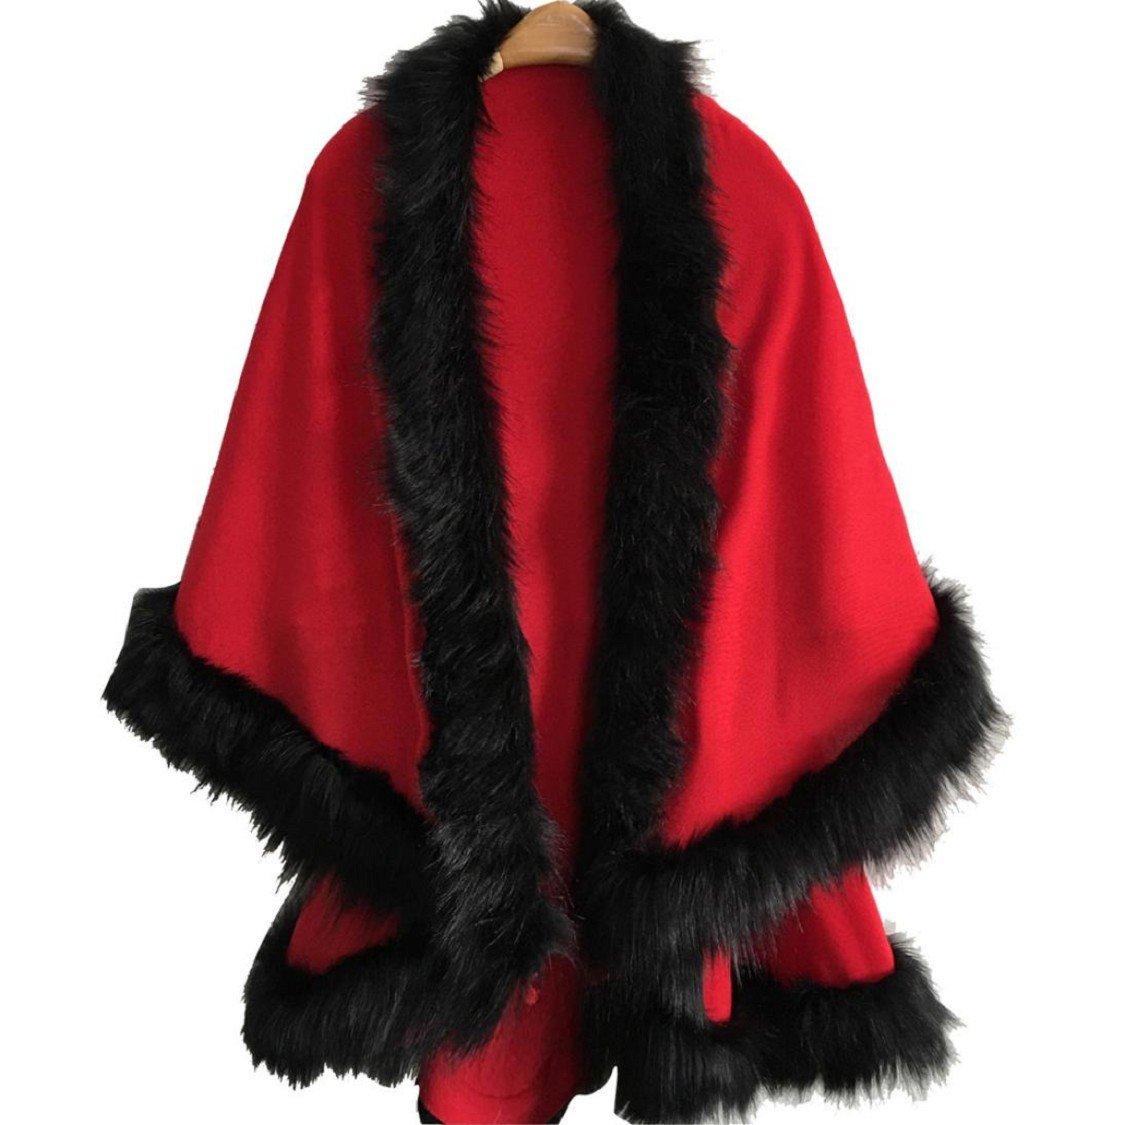 Ikevan Women's Fashion Elegant Faux Fur Collar Poncho Cape Thin Cape Shawl Stole Wrap Hoody Coat Dual-Use Spring Autumn 130x135cm (Khaki)